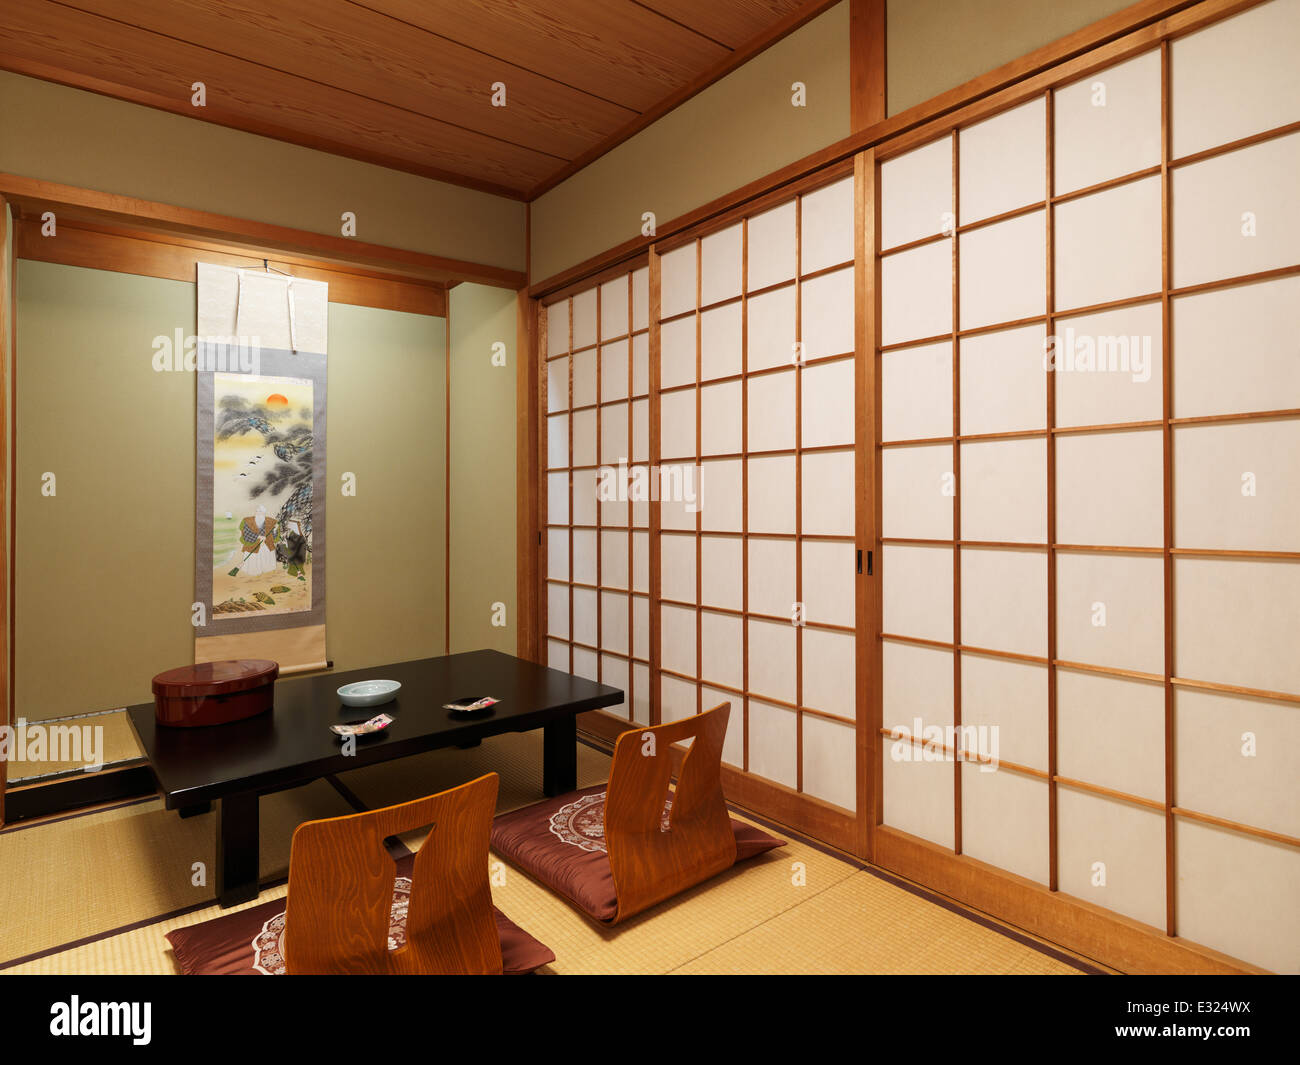 Japanese tea table furniture - Chabudai Tea Table And Zaisu Legless Chairs At Traditional Japanese Room Of Ryokan Hotel In Kyoto Japan